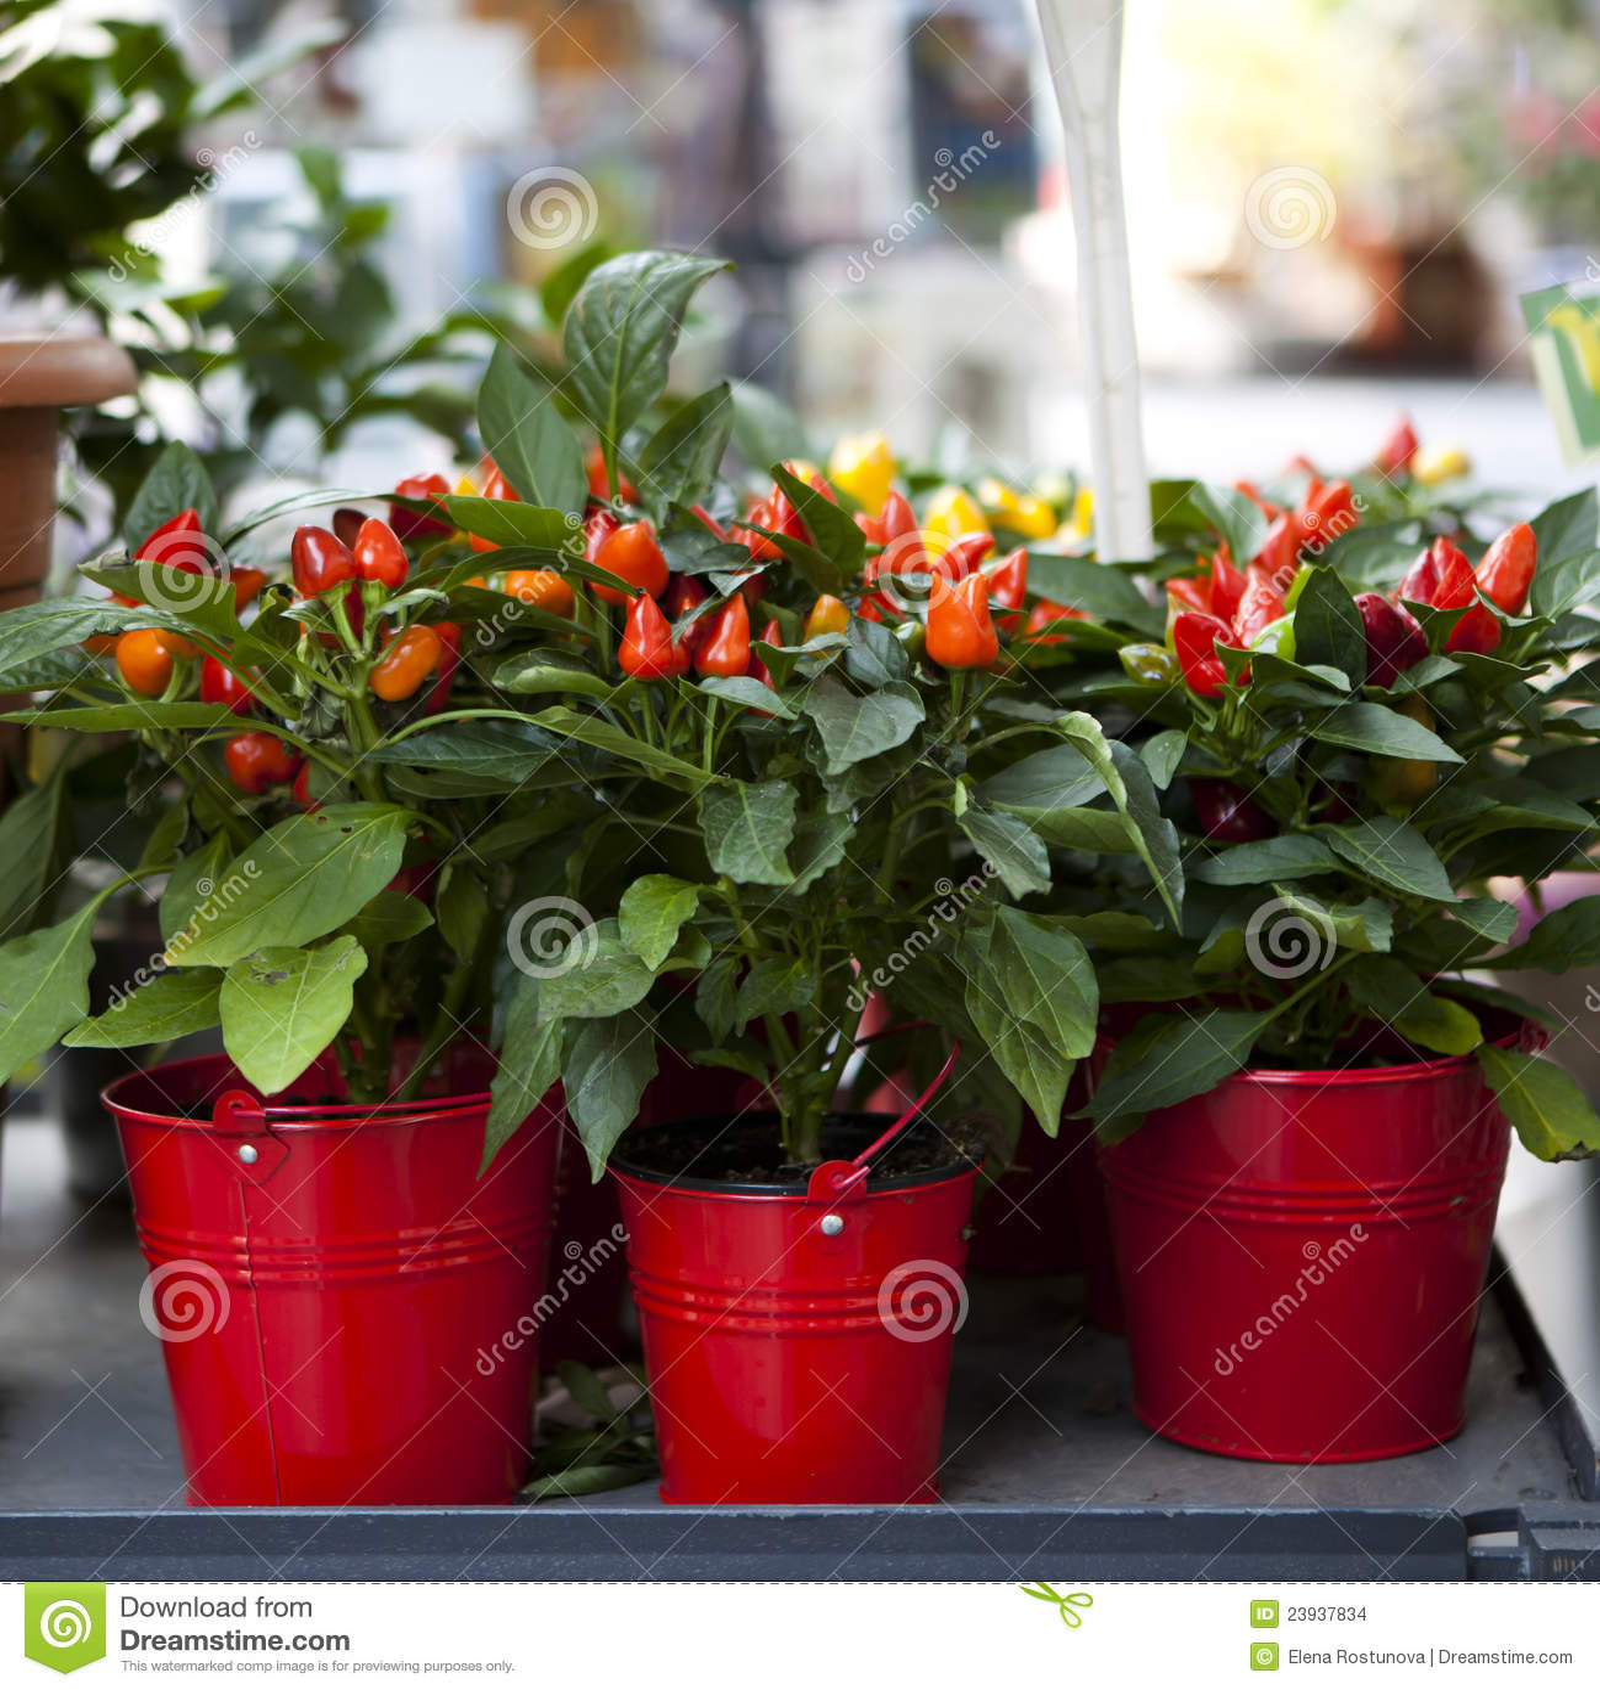 Red ornamental capsicum